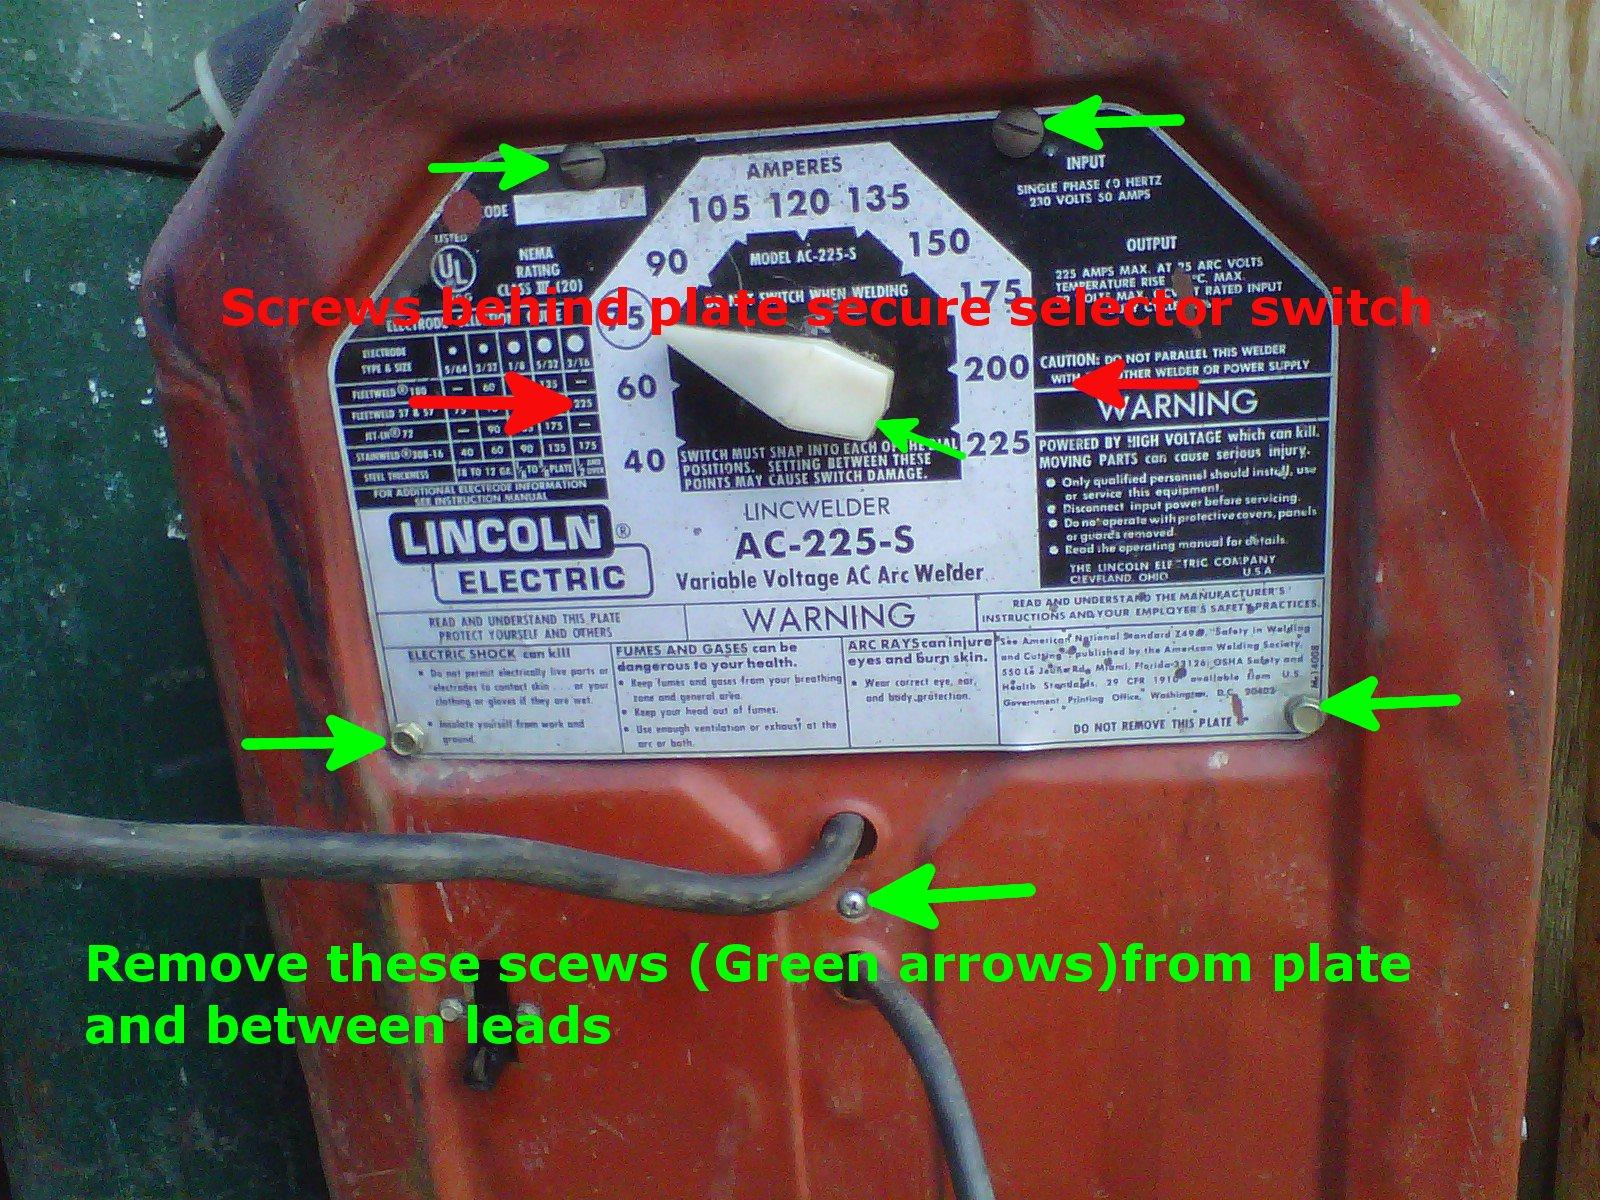 lincoln 225 ac wiring diagram wiring diagram datasourcewire diagram ac 225 s 16 [ 1600 x 1200 Pixel ]